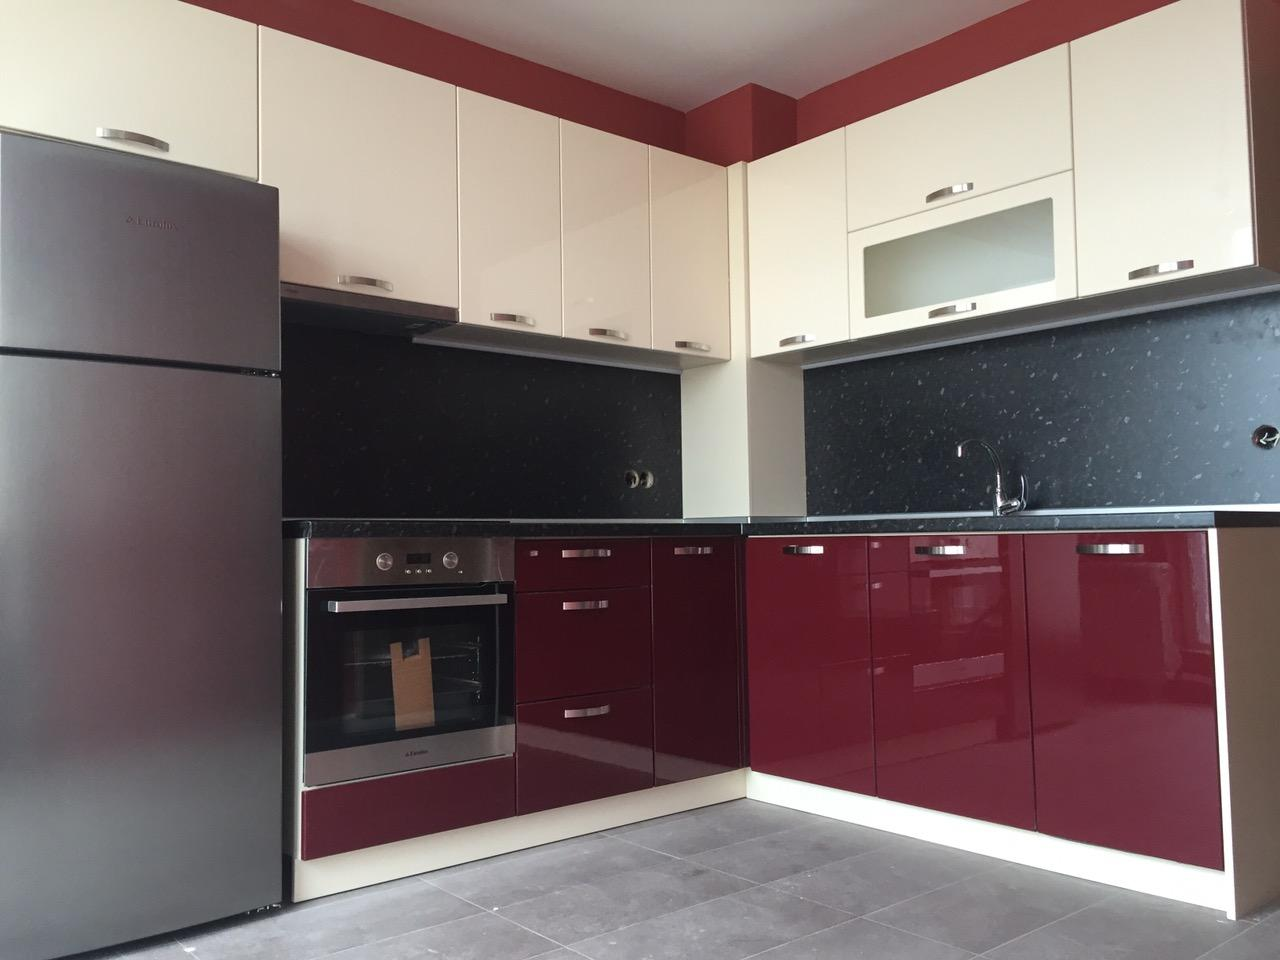 Кухненско обзавеждане - Памук, бордо и крем